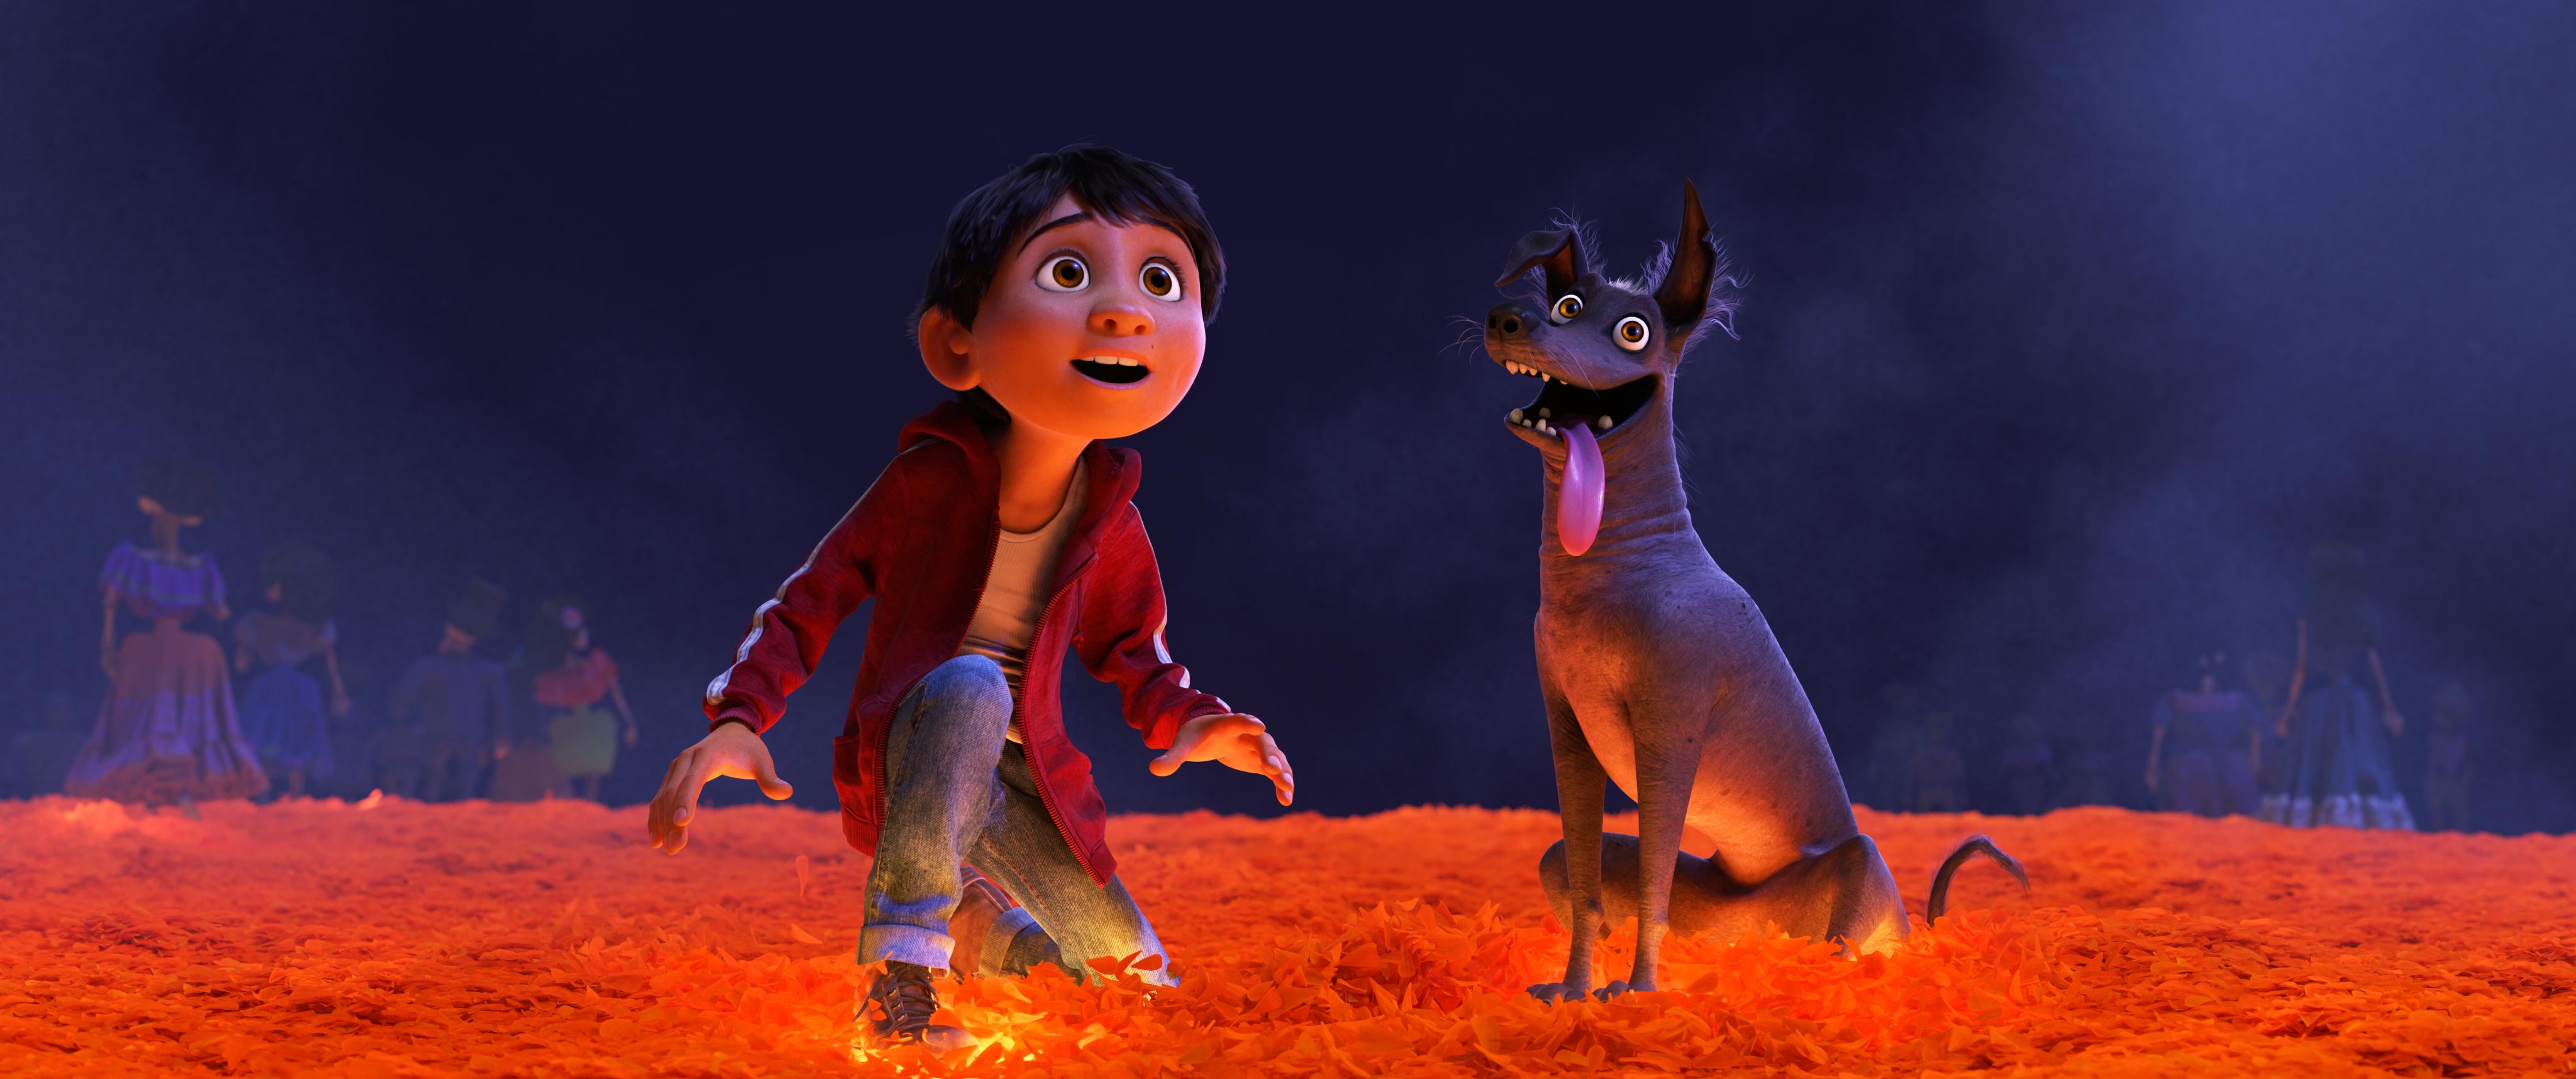 Disney Pixar S Coco Presents Dante S Lunch A Short Tail